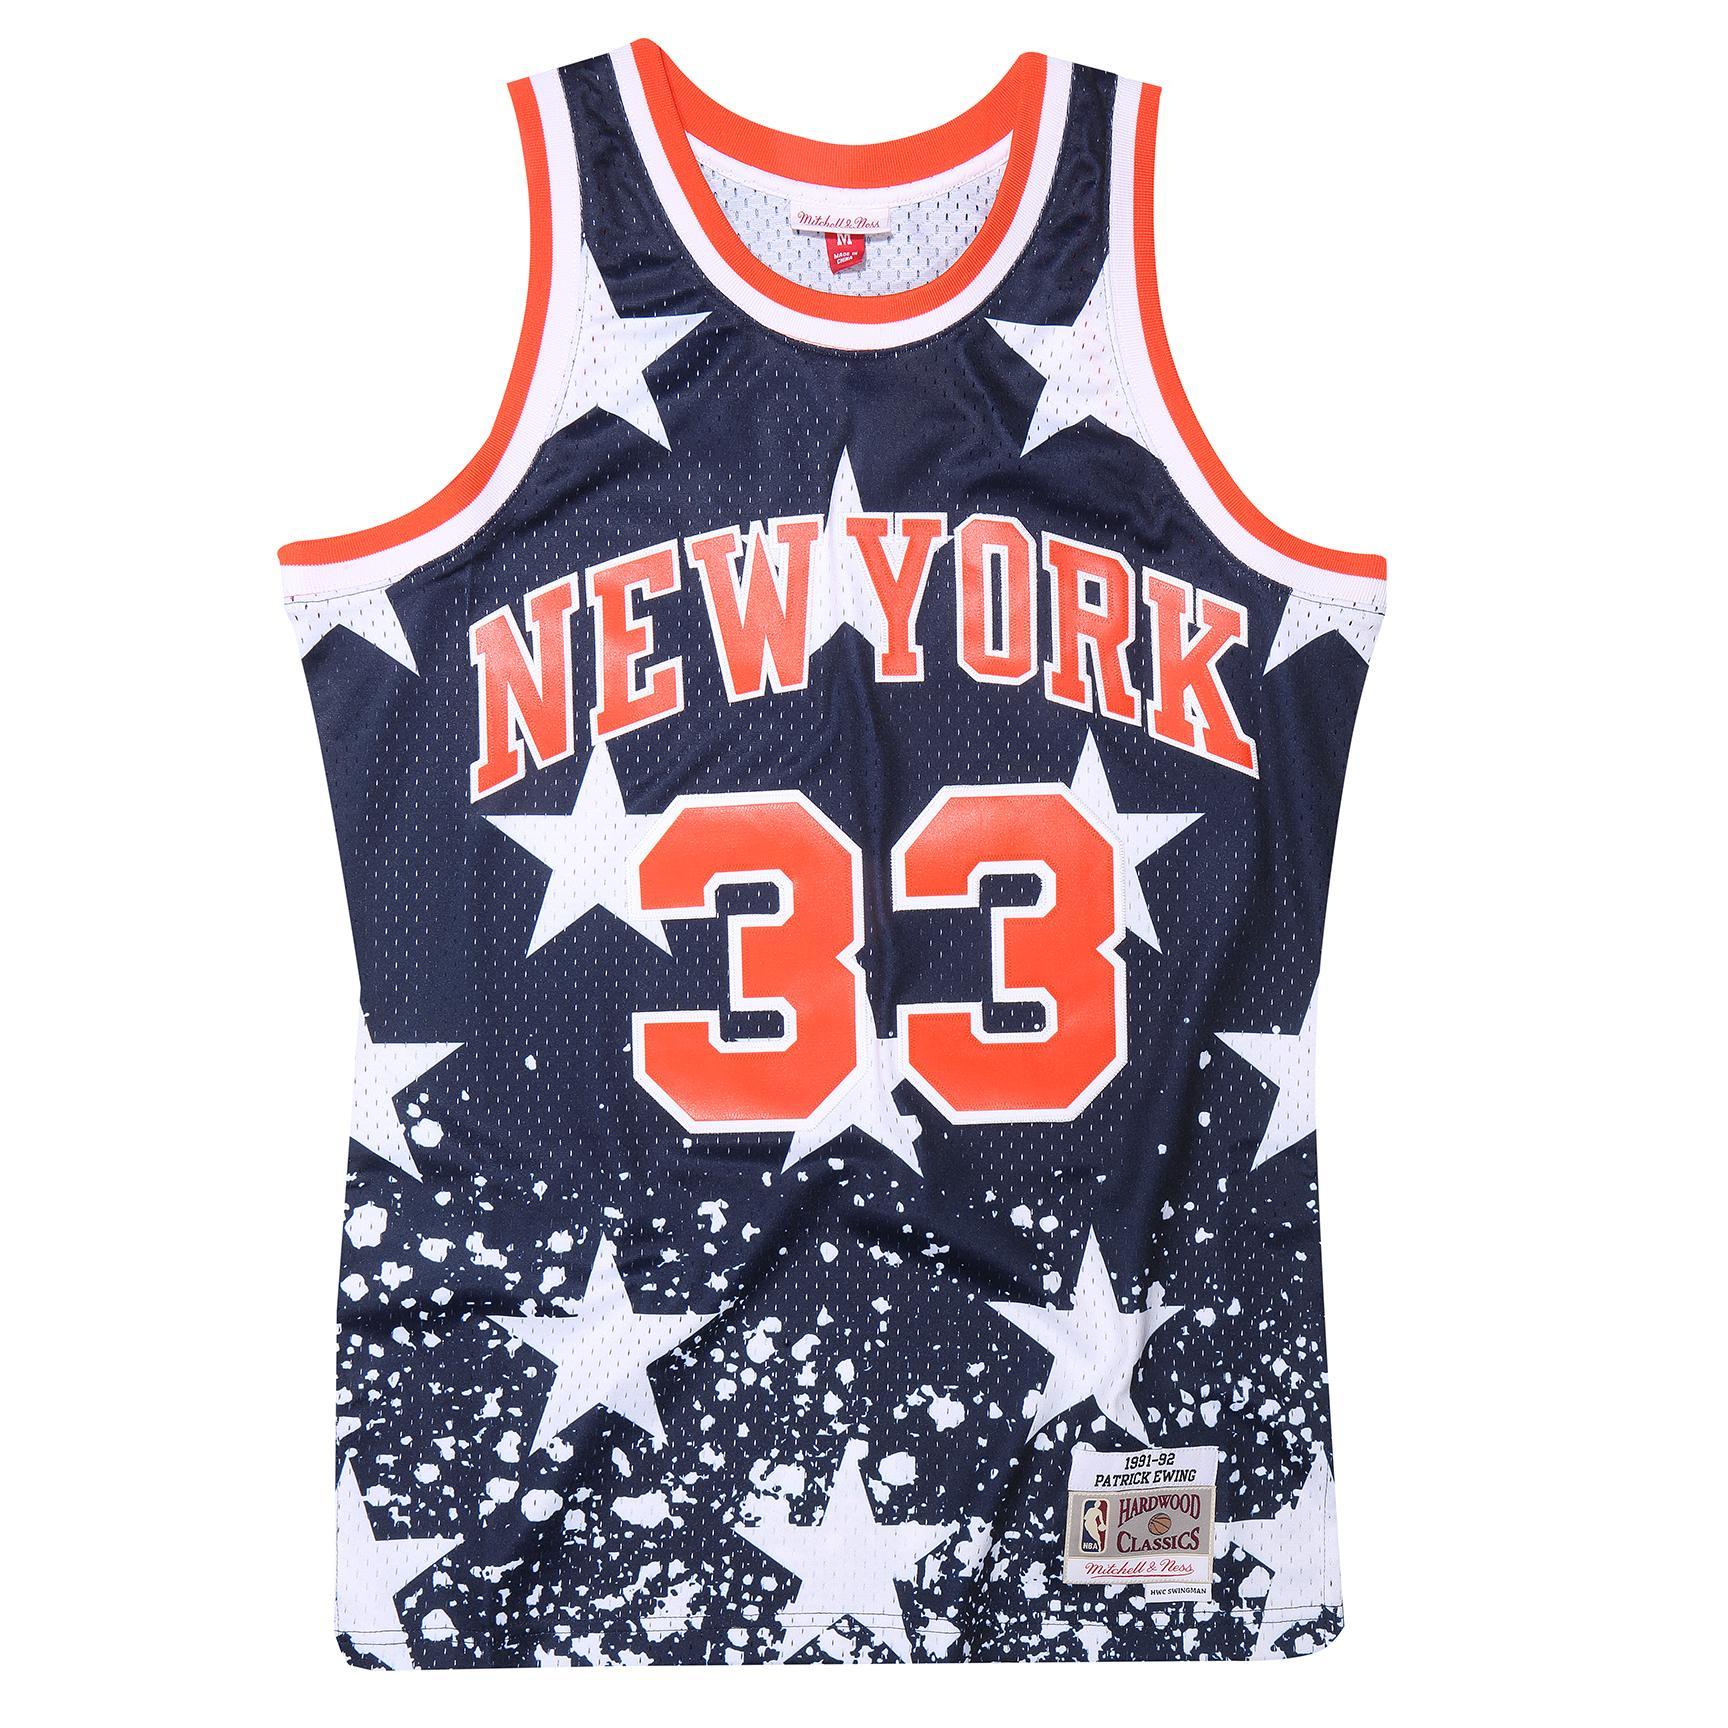 41f560952ac Patrick Ewing 1991-92 4th July Swingman Jersey New York Knicks £90.00